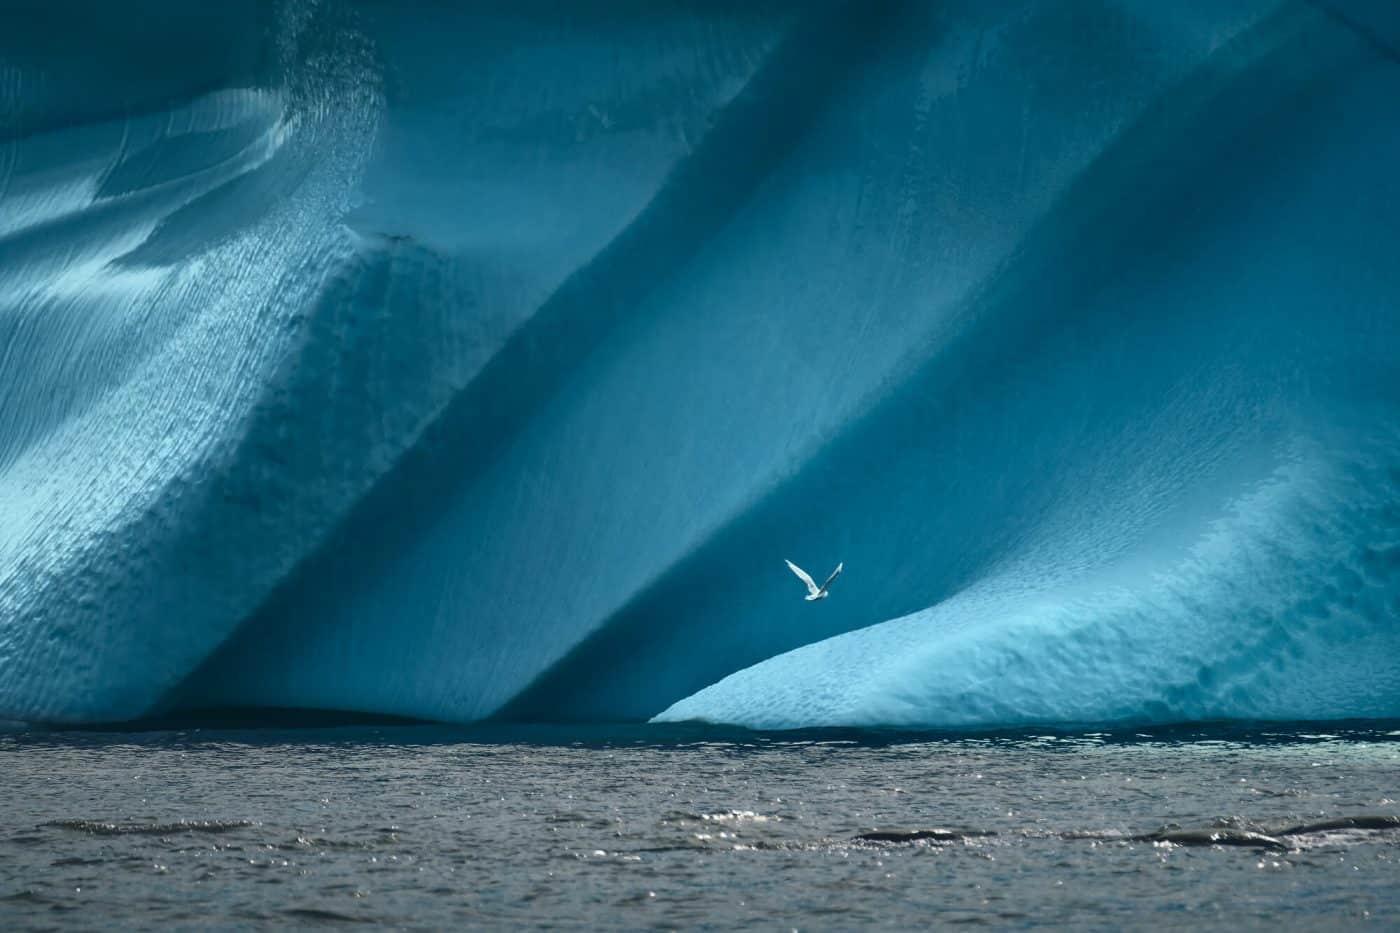 Greenland bird in front of iceberg. Photo by Maria Sahai.